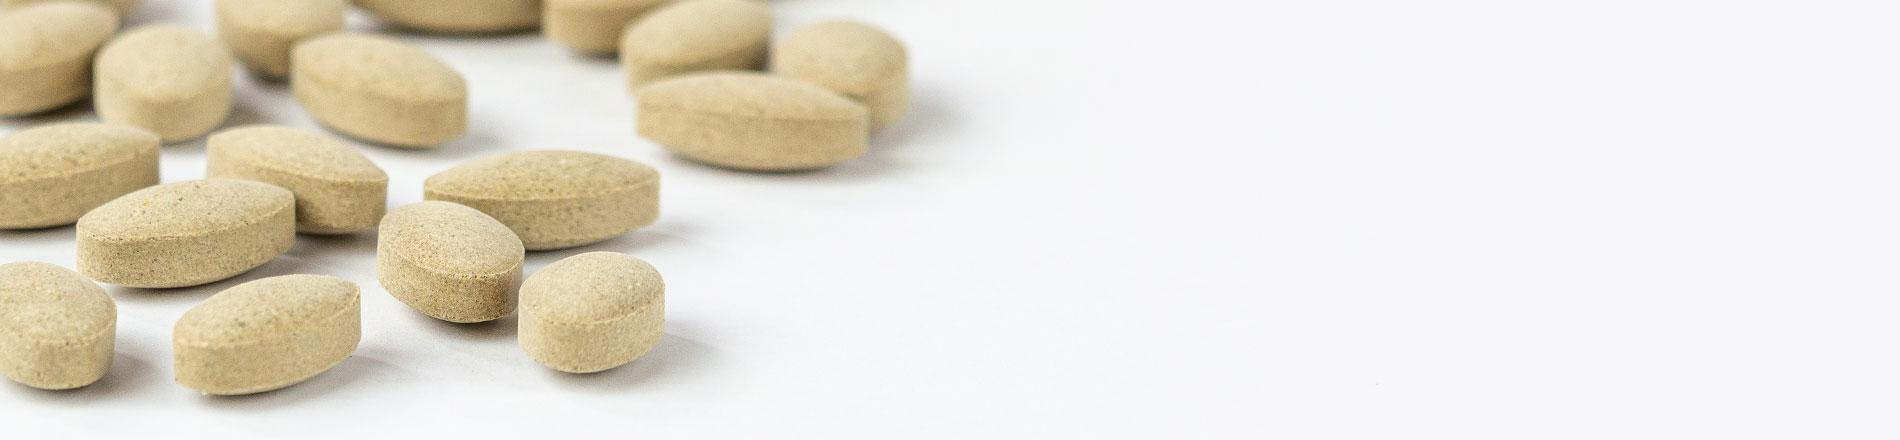 Lung Formula tablets